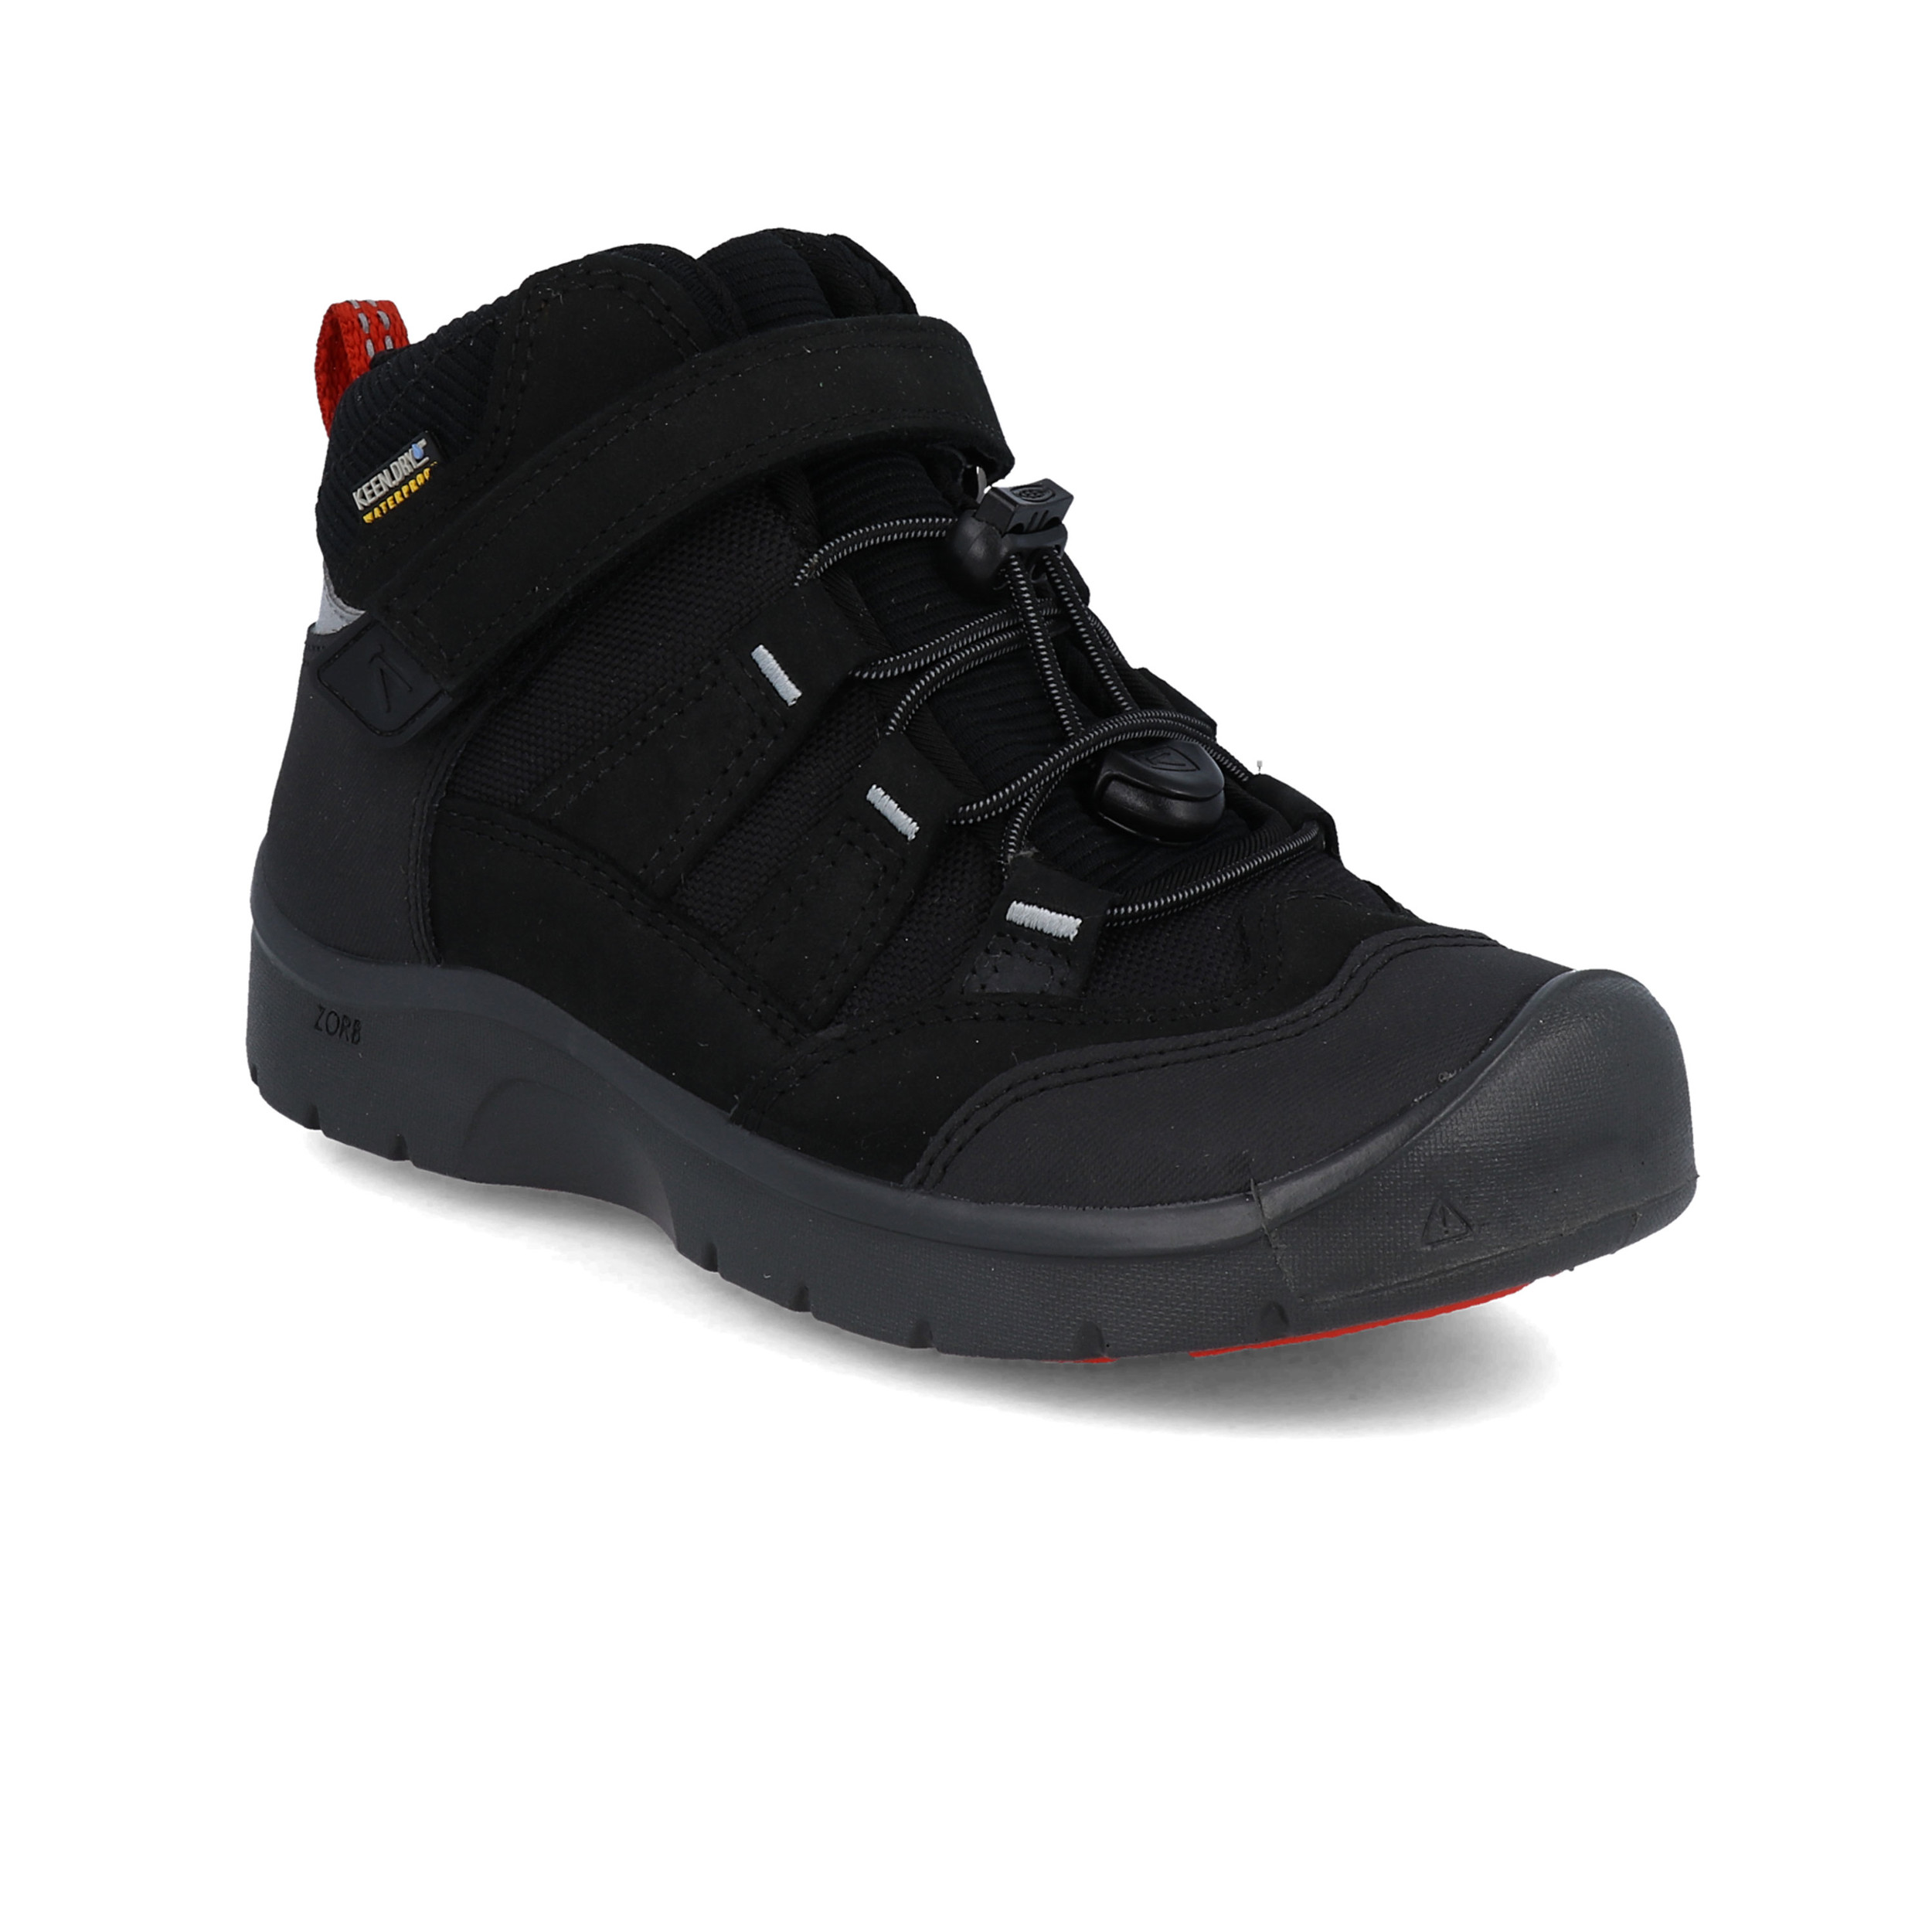 Keen Boys Hikeport Waterproof Walking Shoes Black Sports Outdoors Breathable